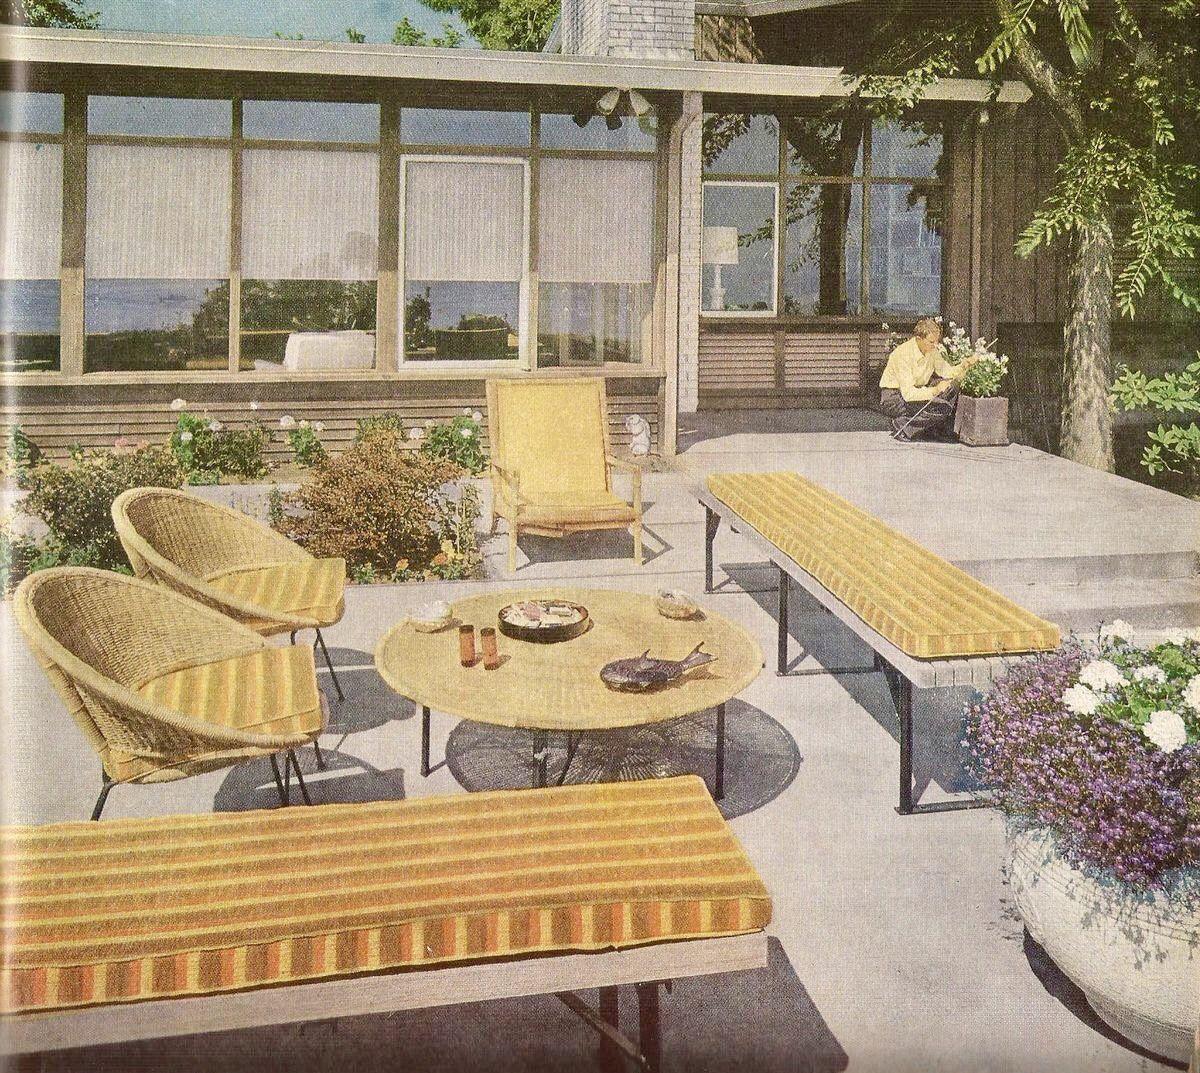 9520f37d6e2d88f61542044e92f342c6 - Better Homes And Gardens Palm Springs